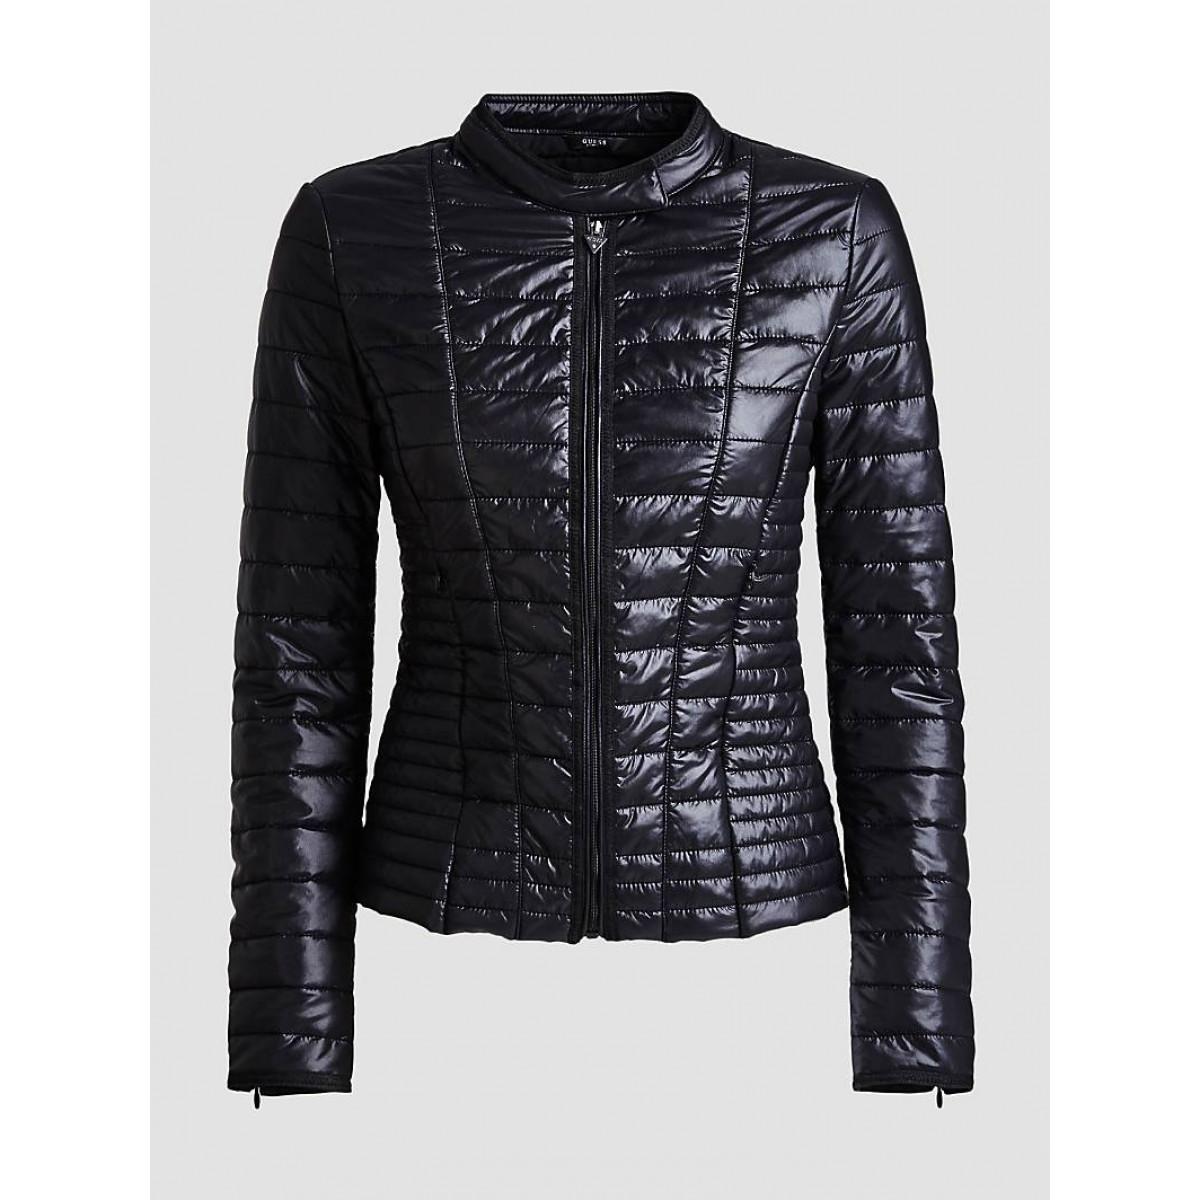 sale retailer 452b7 7a064 GUESS - Piumino W91L48 WBAD0 JBLK - Down Jackets - Outerwear ...